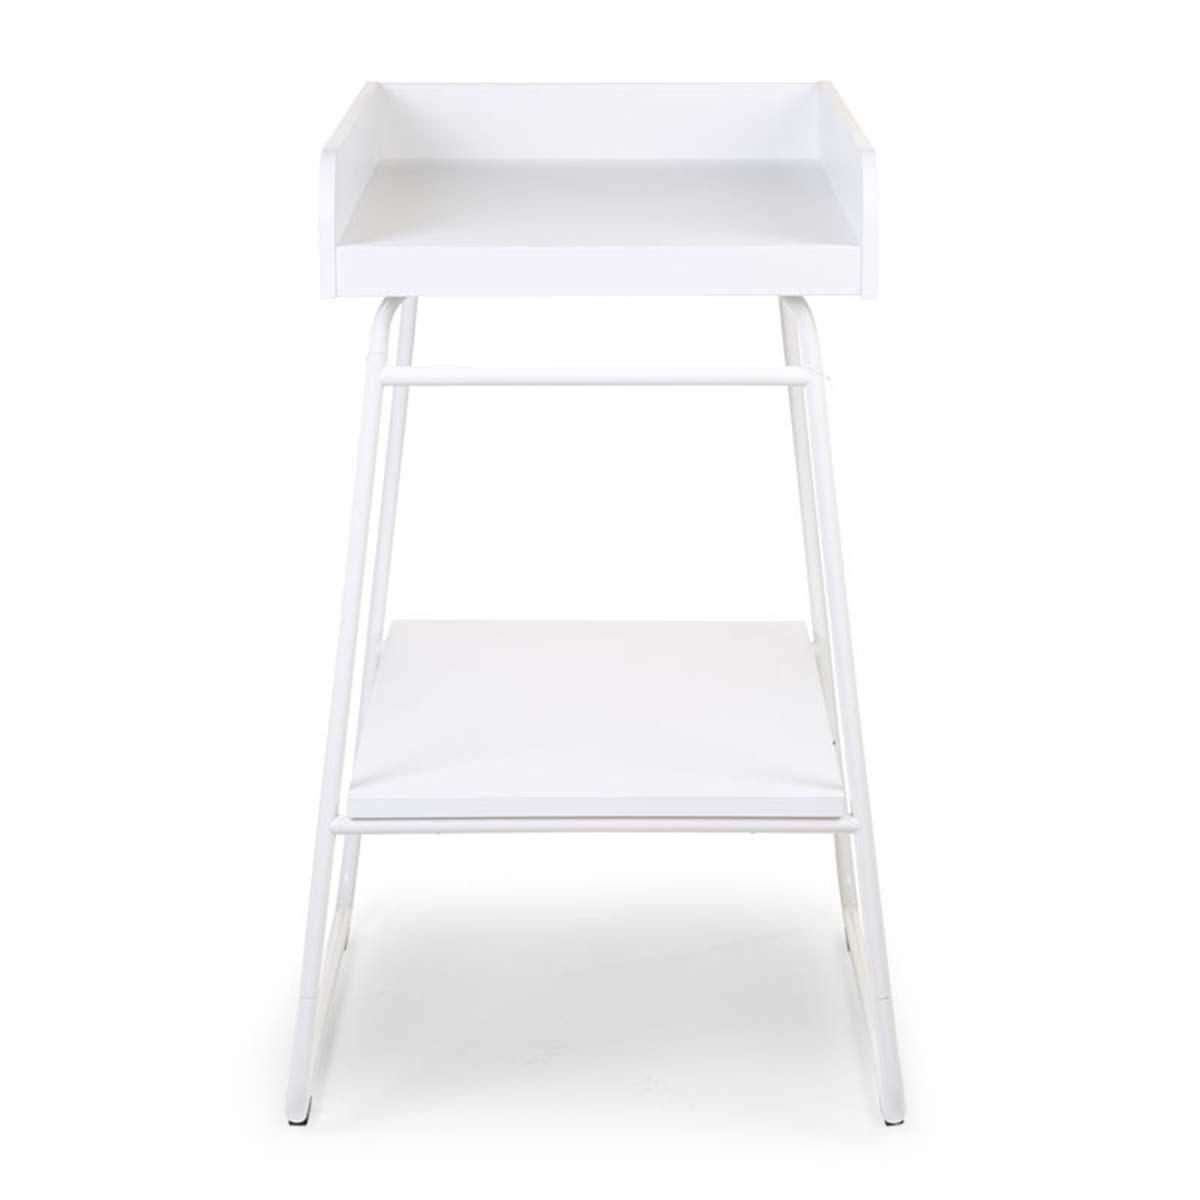 Table à langer Table à Langer Ironwood - Blanc Table à Langer Ironwood - Blanc